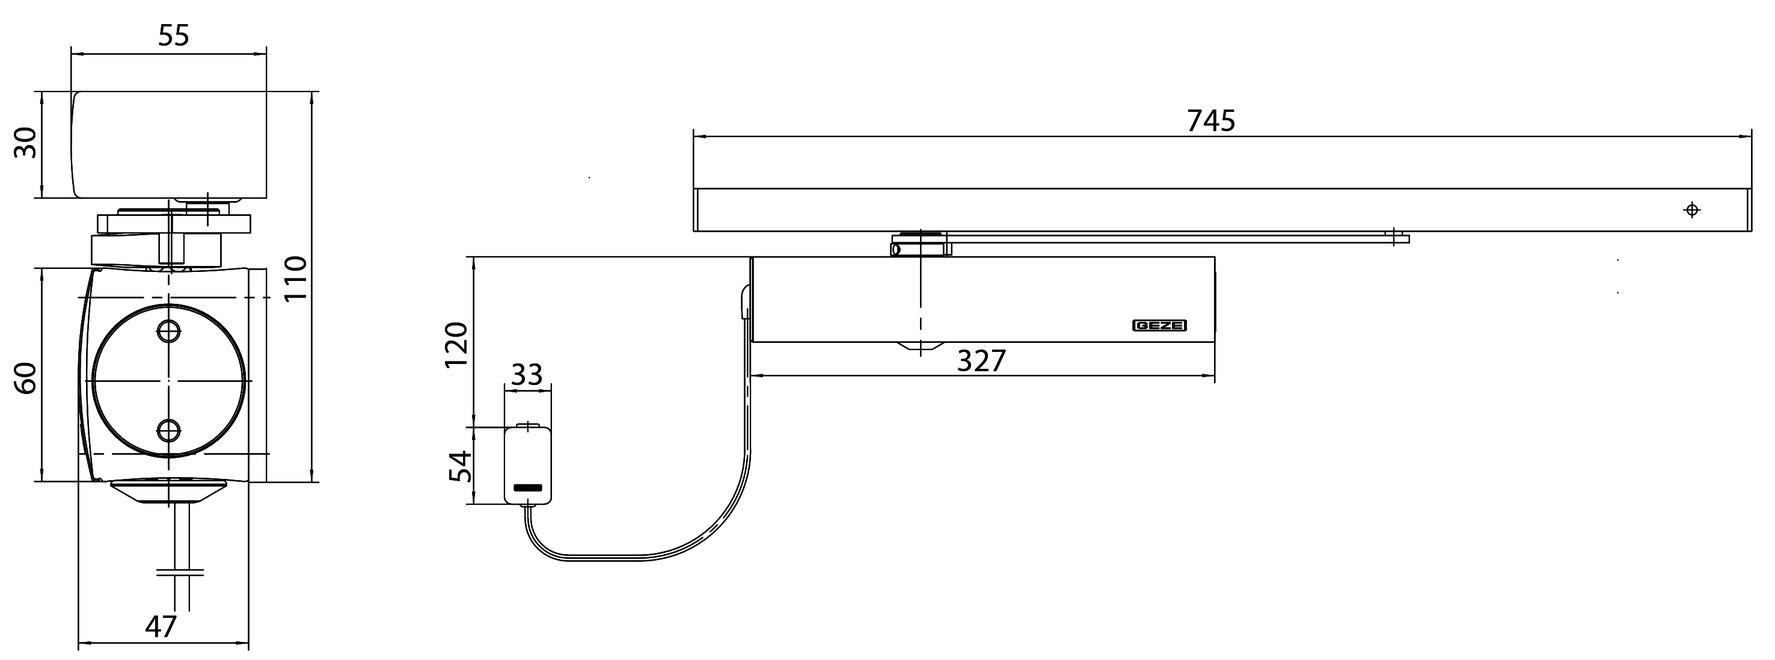 Freilauf-Türschliesser GEZE TS 5000 RFS